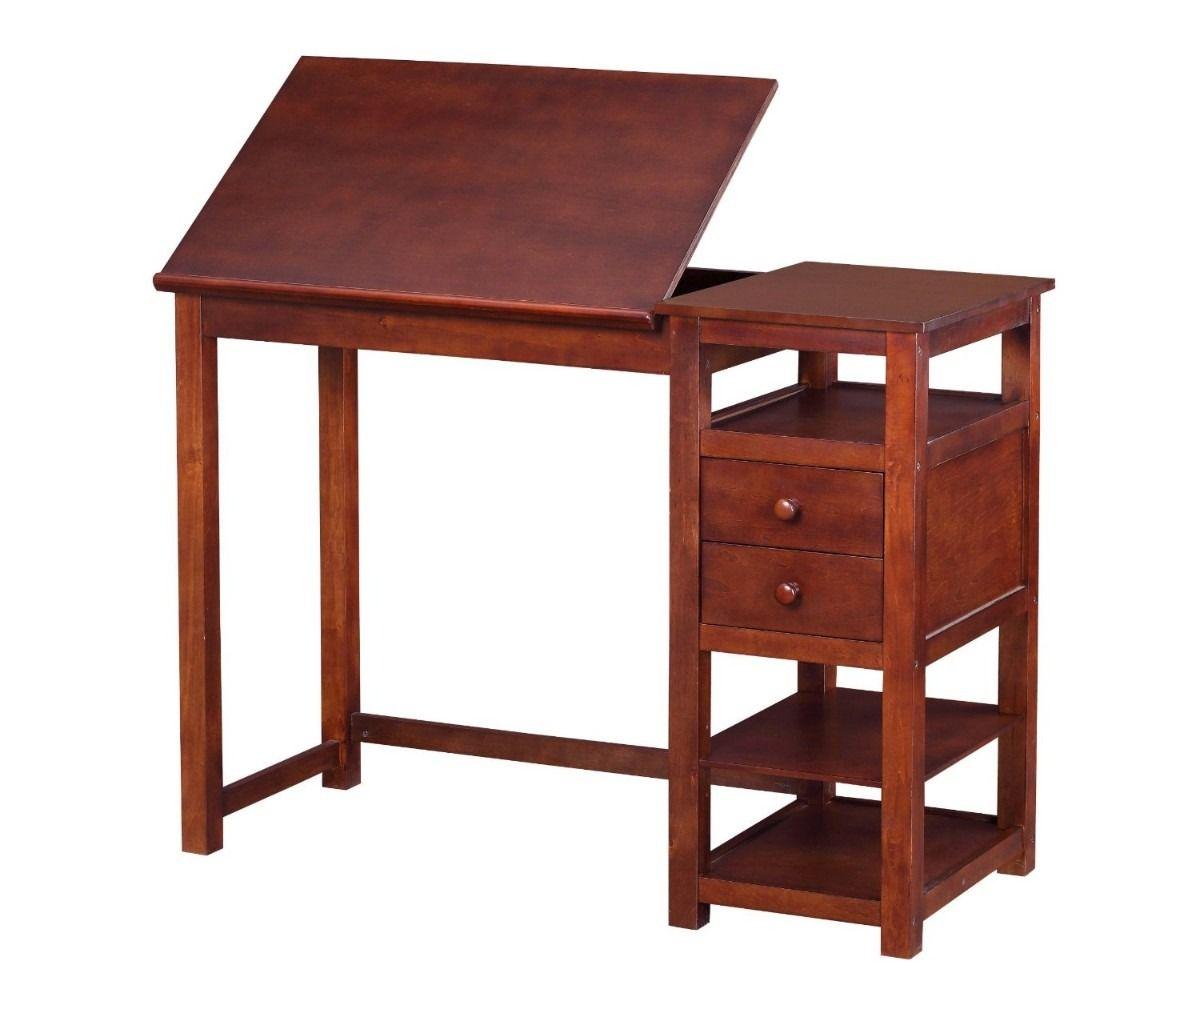 Mesas De Dibujo Con Escritorio Para Arquitectos Buscar Con Google Muebles Para Espacios Reducidos Mesa De Dibujo Diseno De Muebles